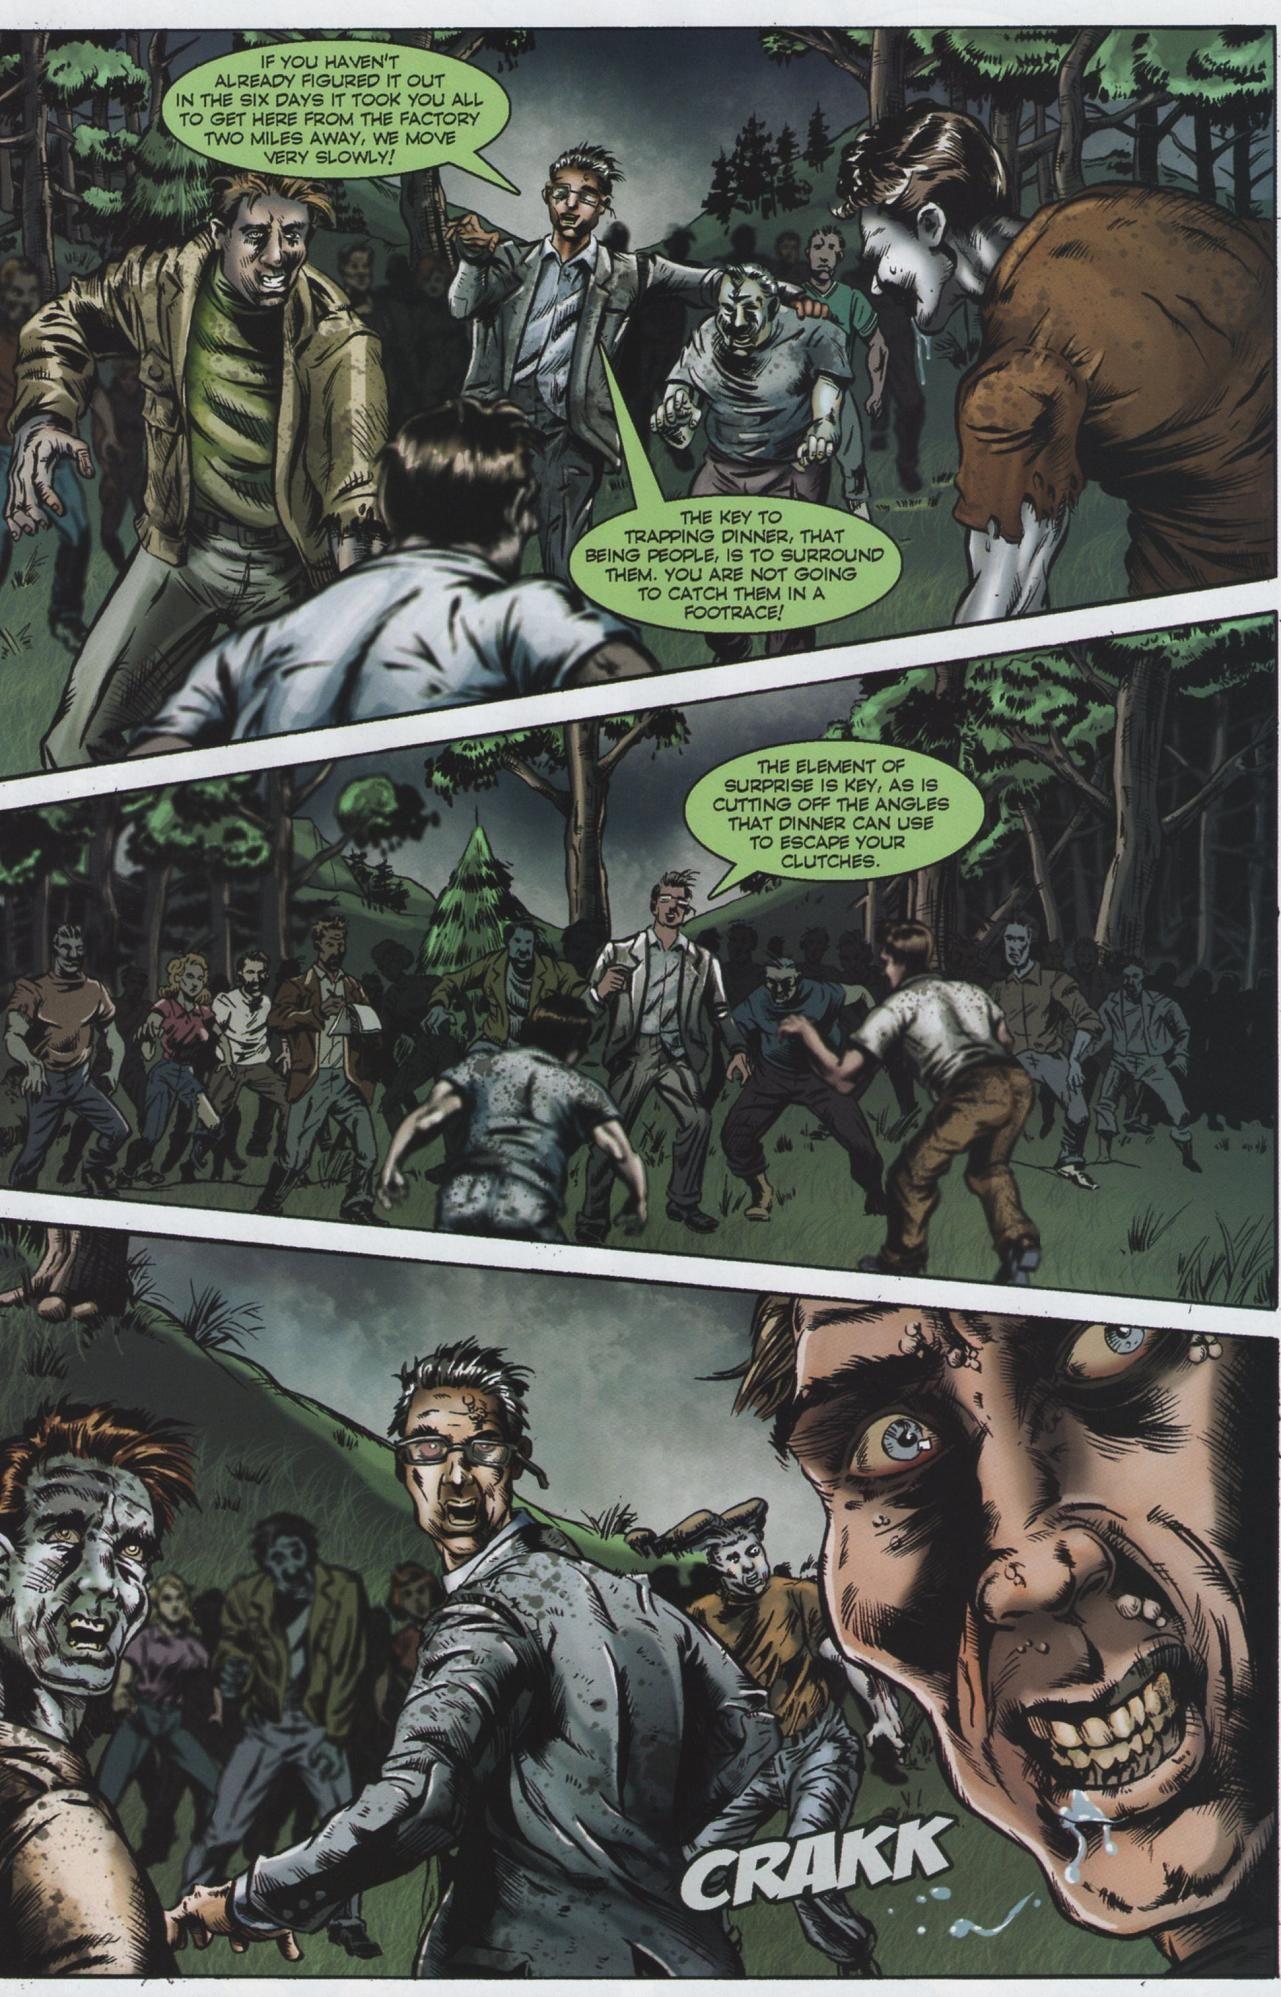 порно комикс с зомби № 142494 бесплатно